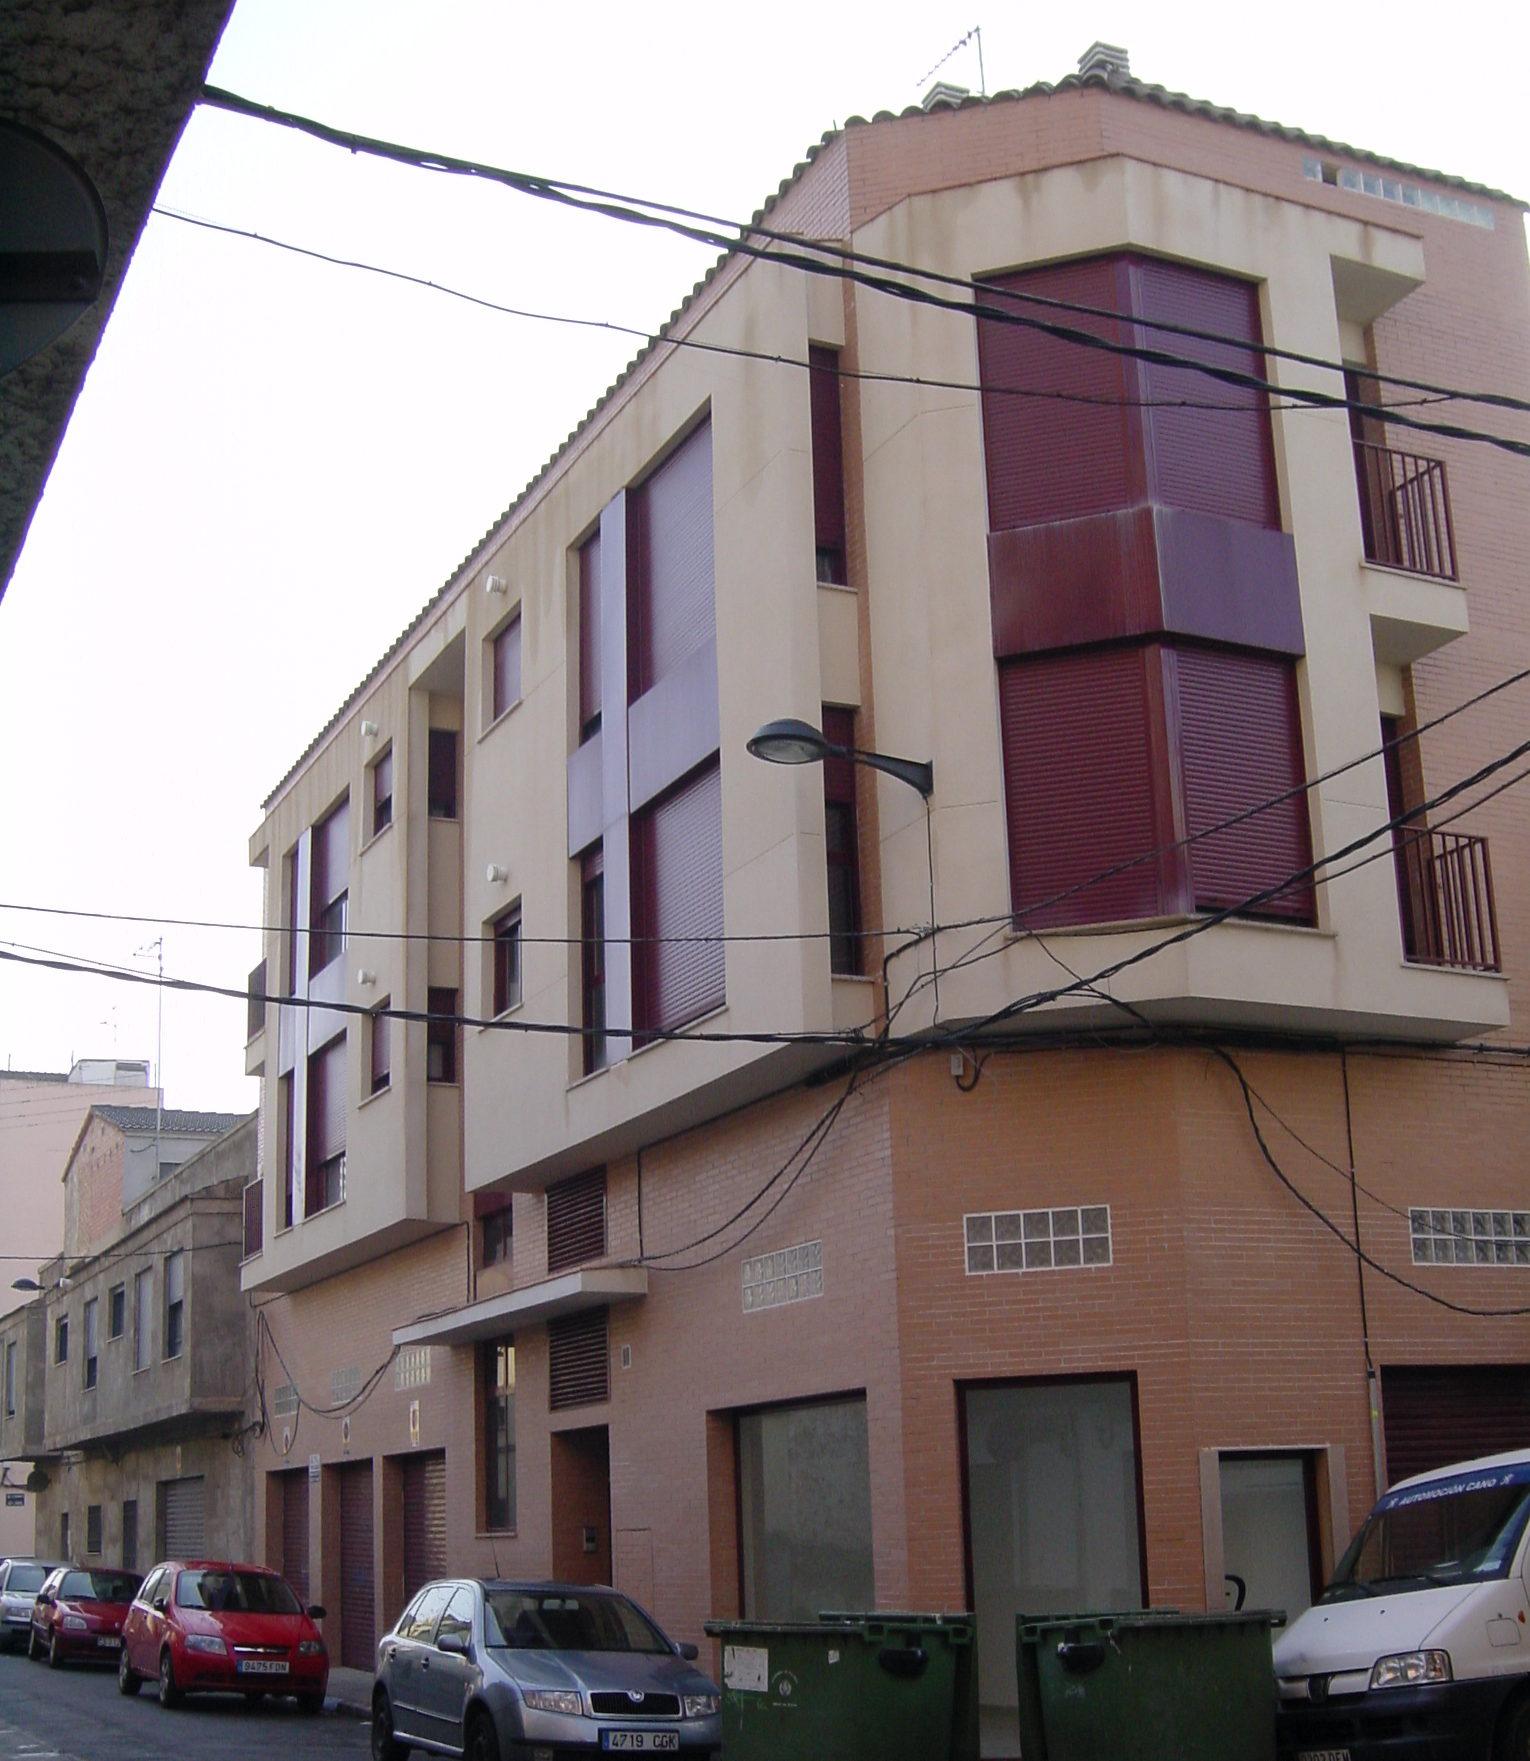 Residencial Plurifamiliar calle Salud